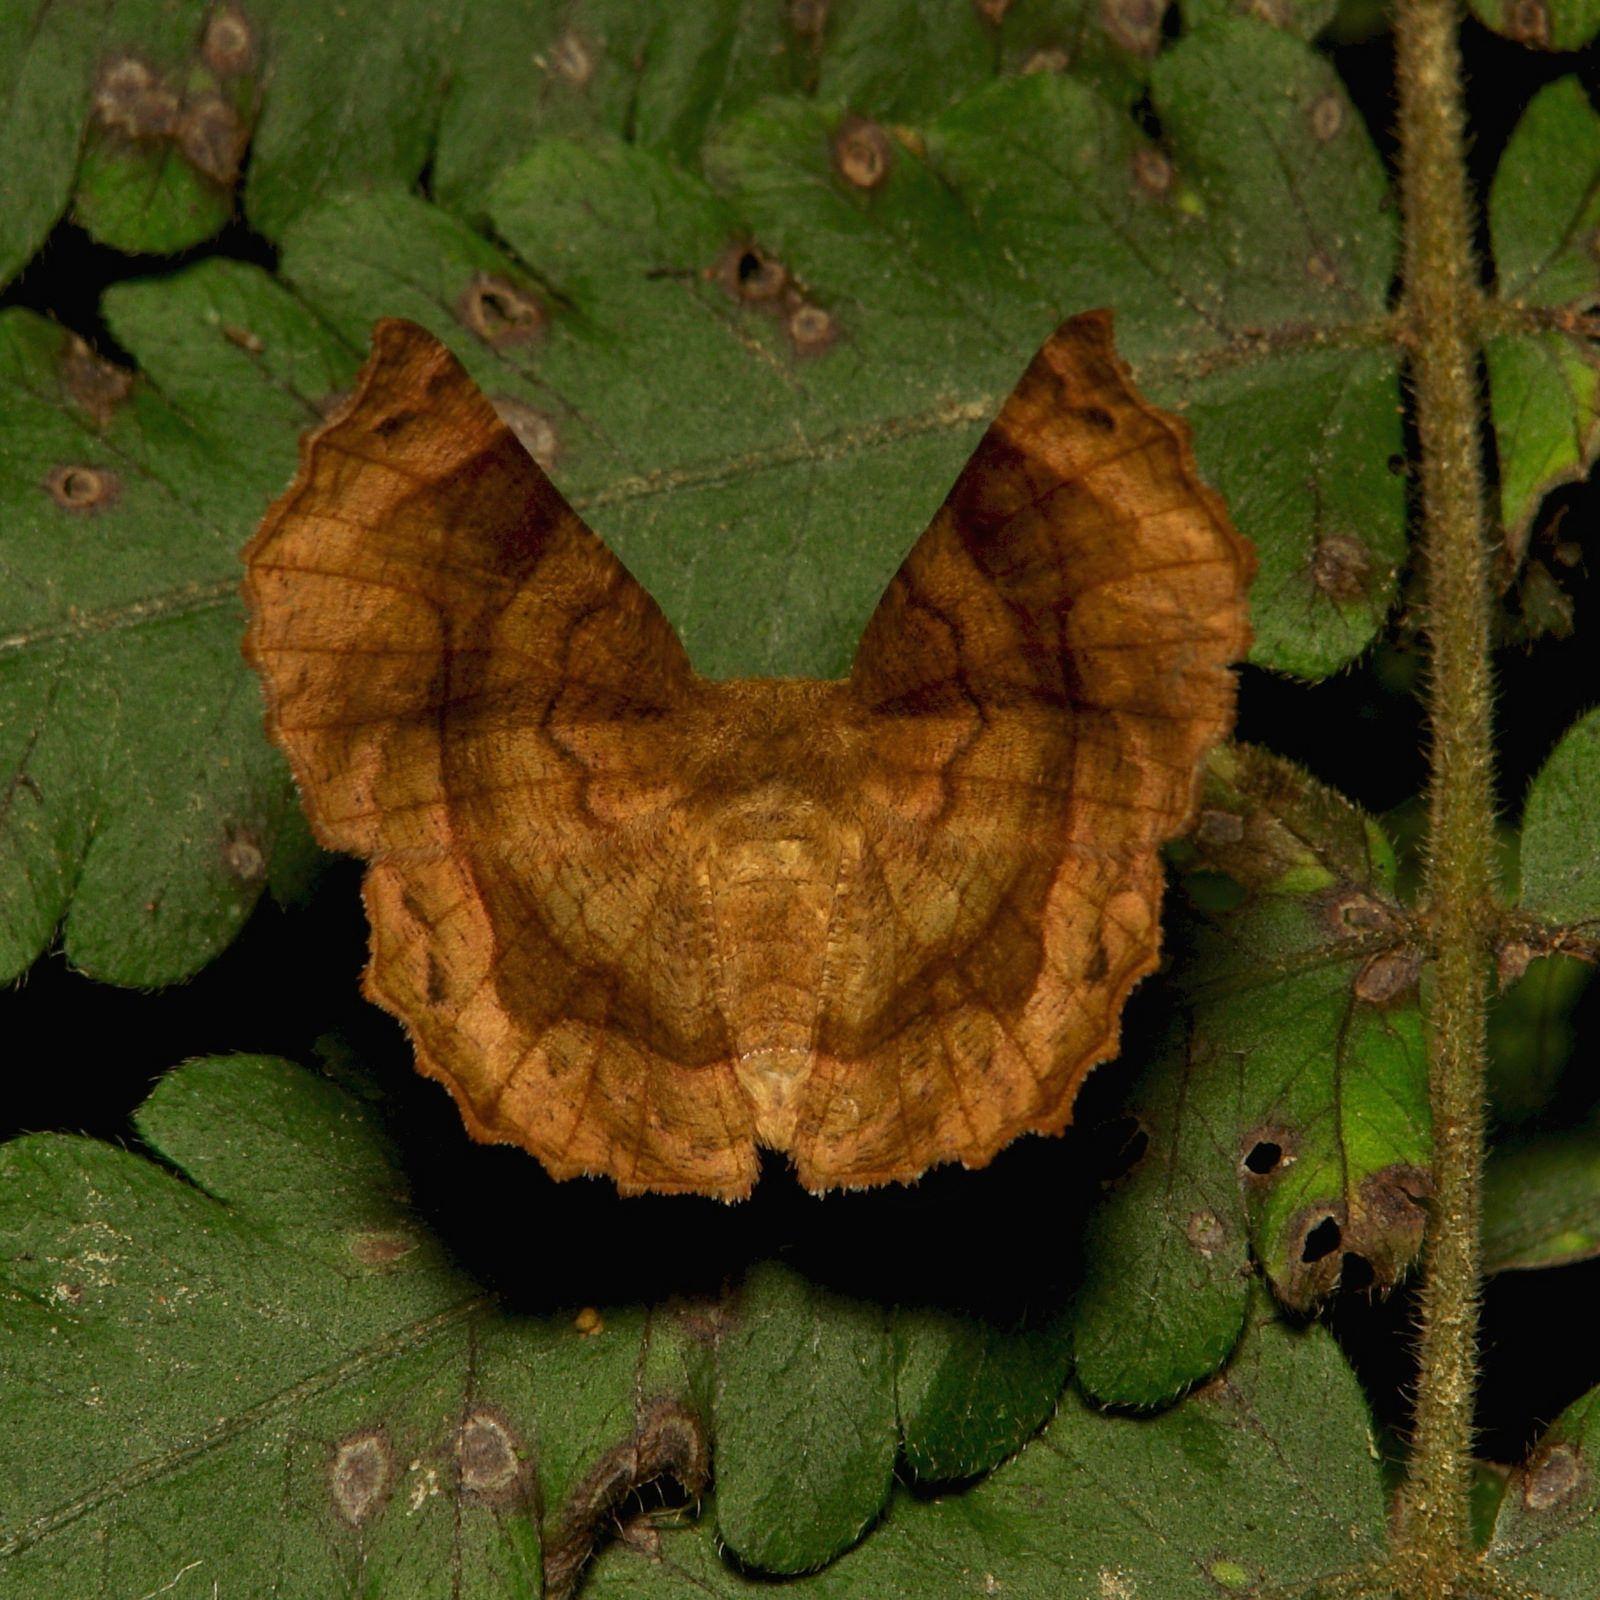 Geometrid Moth (perhaps Hyperythra Sp., Ennominae